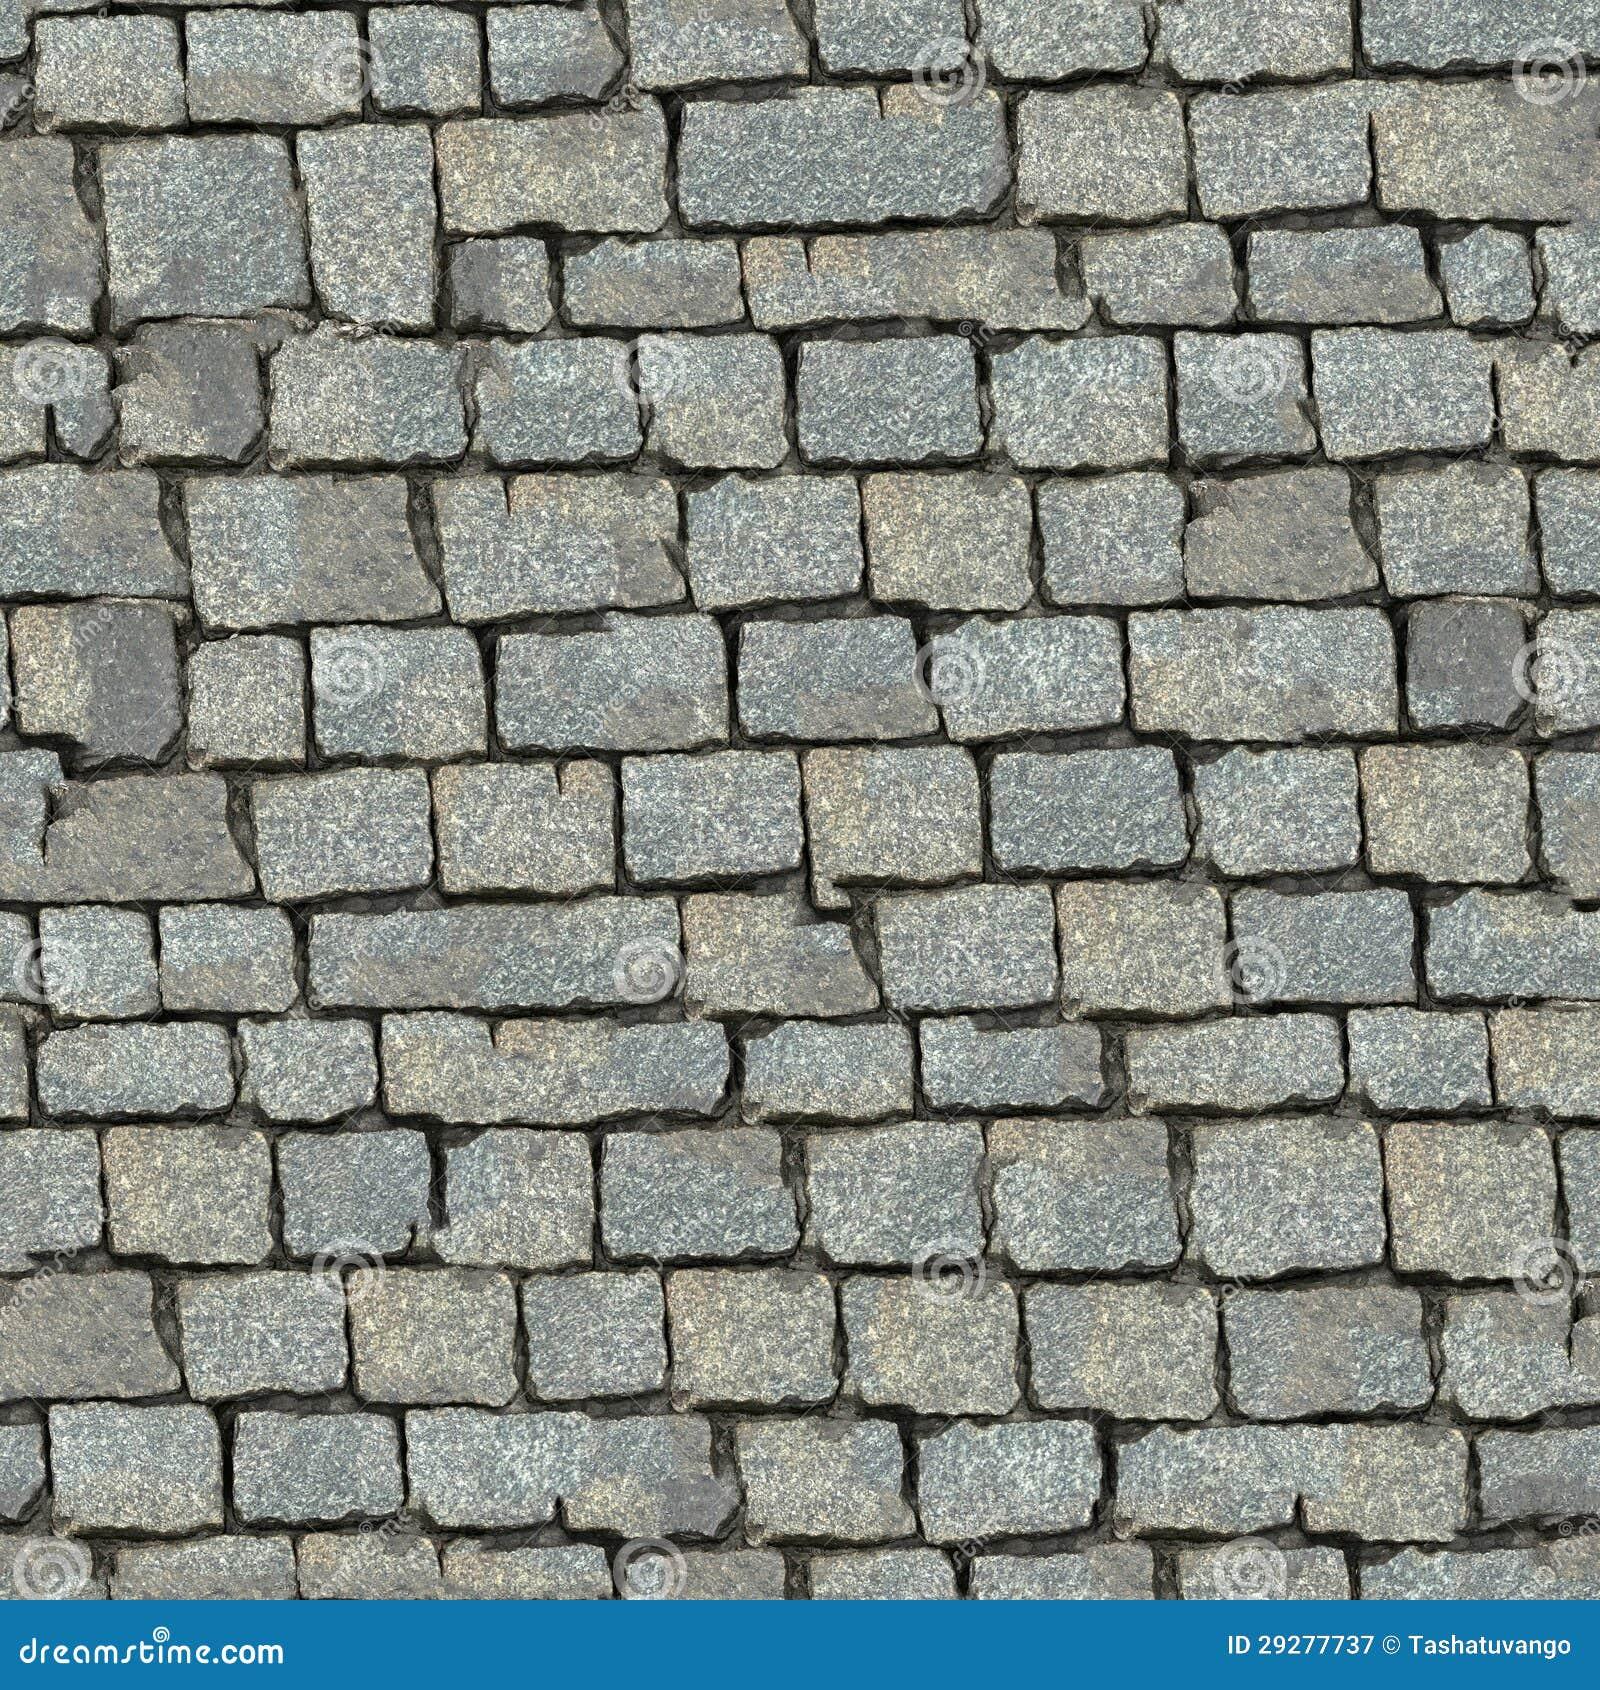 Stone Block Texture : Stone block seamless texture stock image of